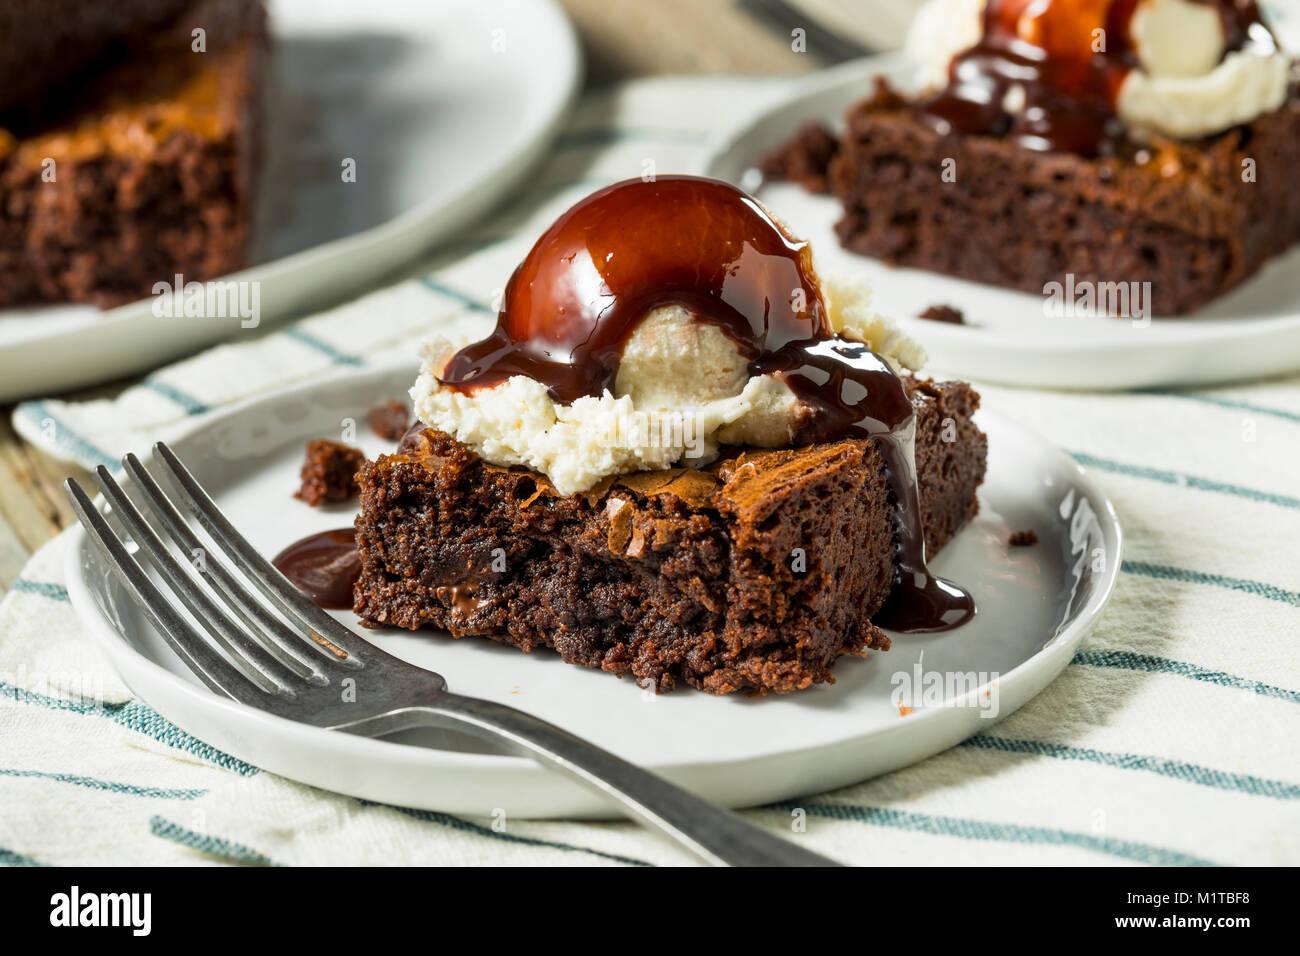 Double Dark Chocolate Brownies with Ice Cream - Stock Image